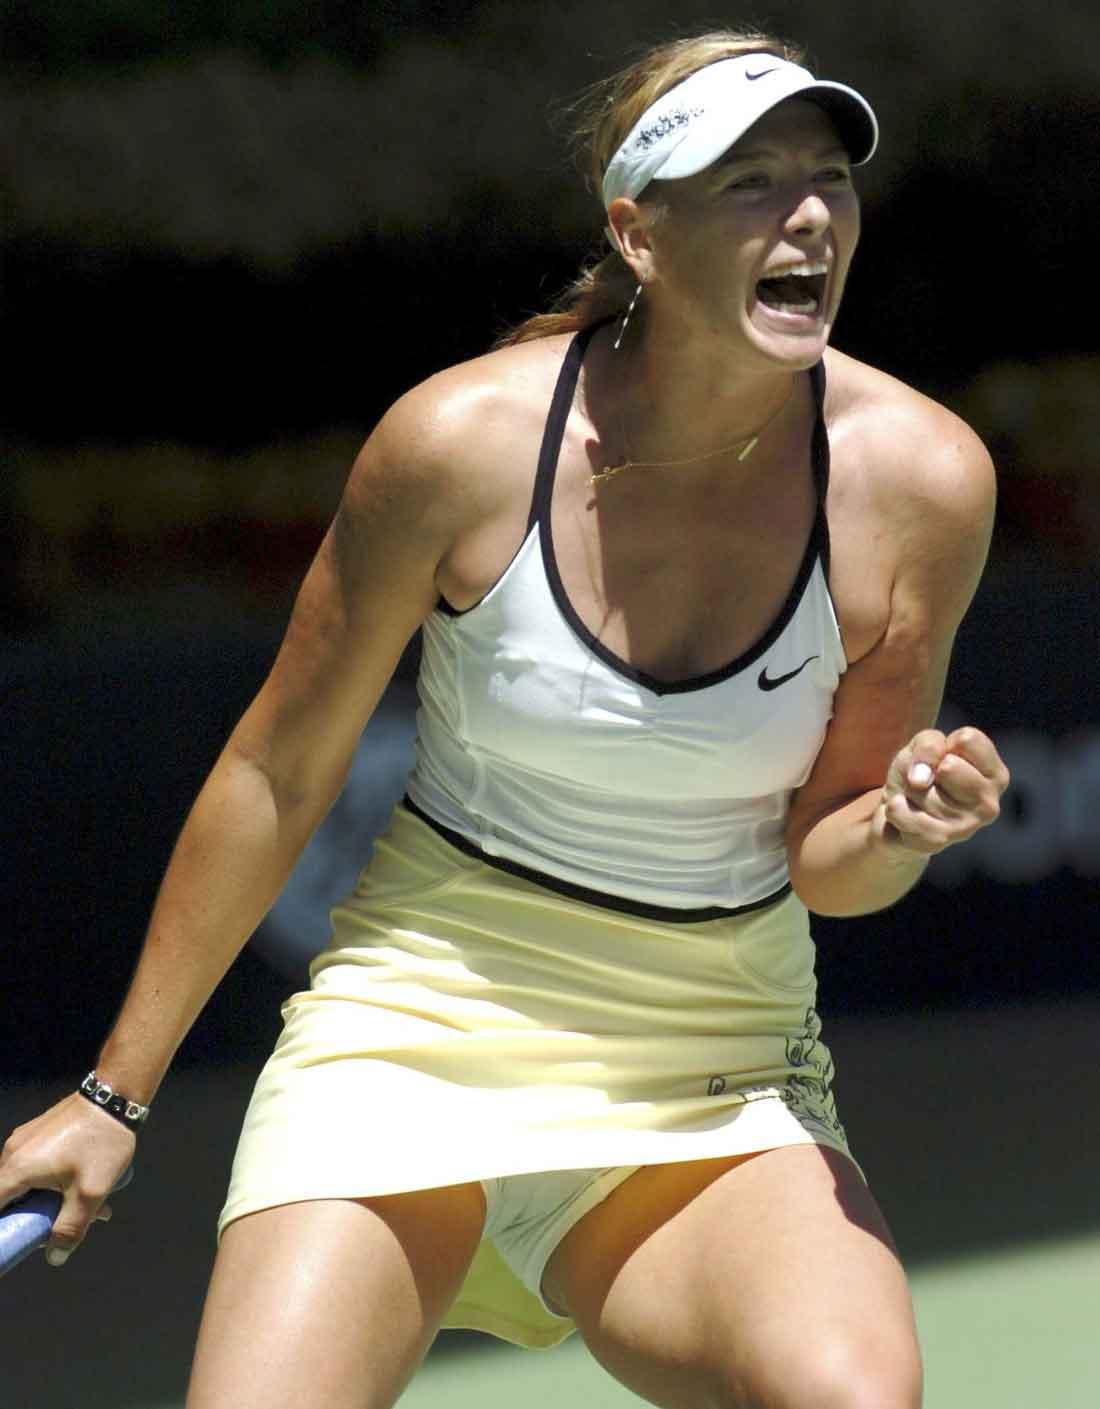 Фото под юбкой тенисисток 3 фотография